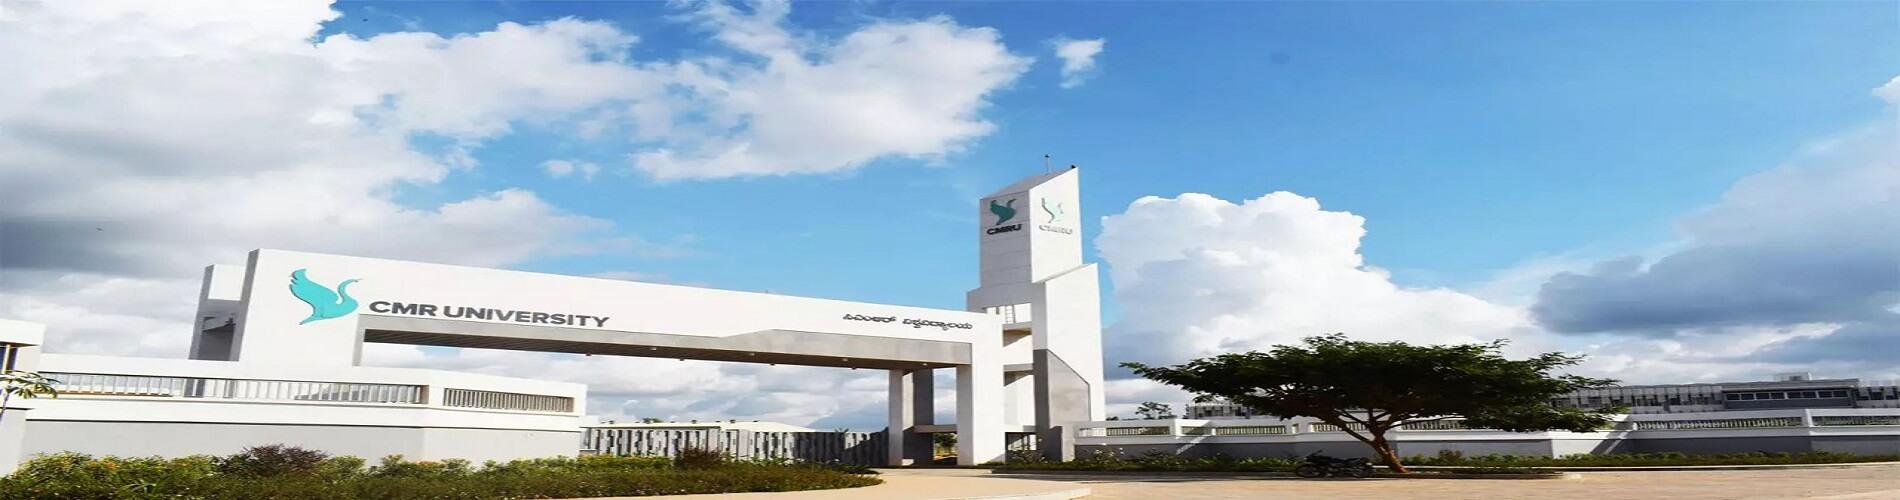 Cmrit-bangalore-admission